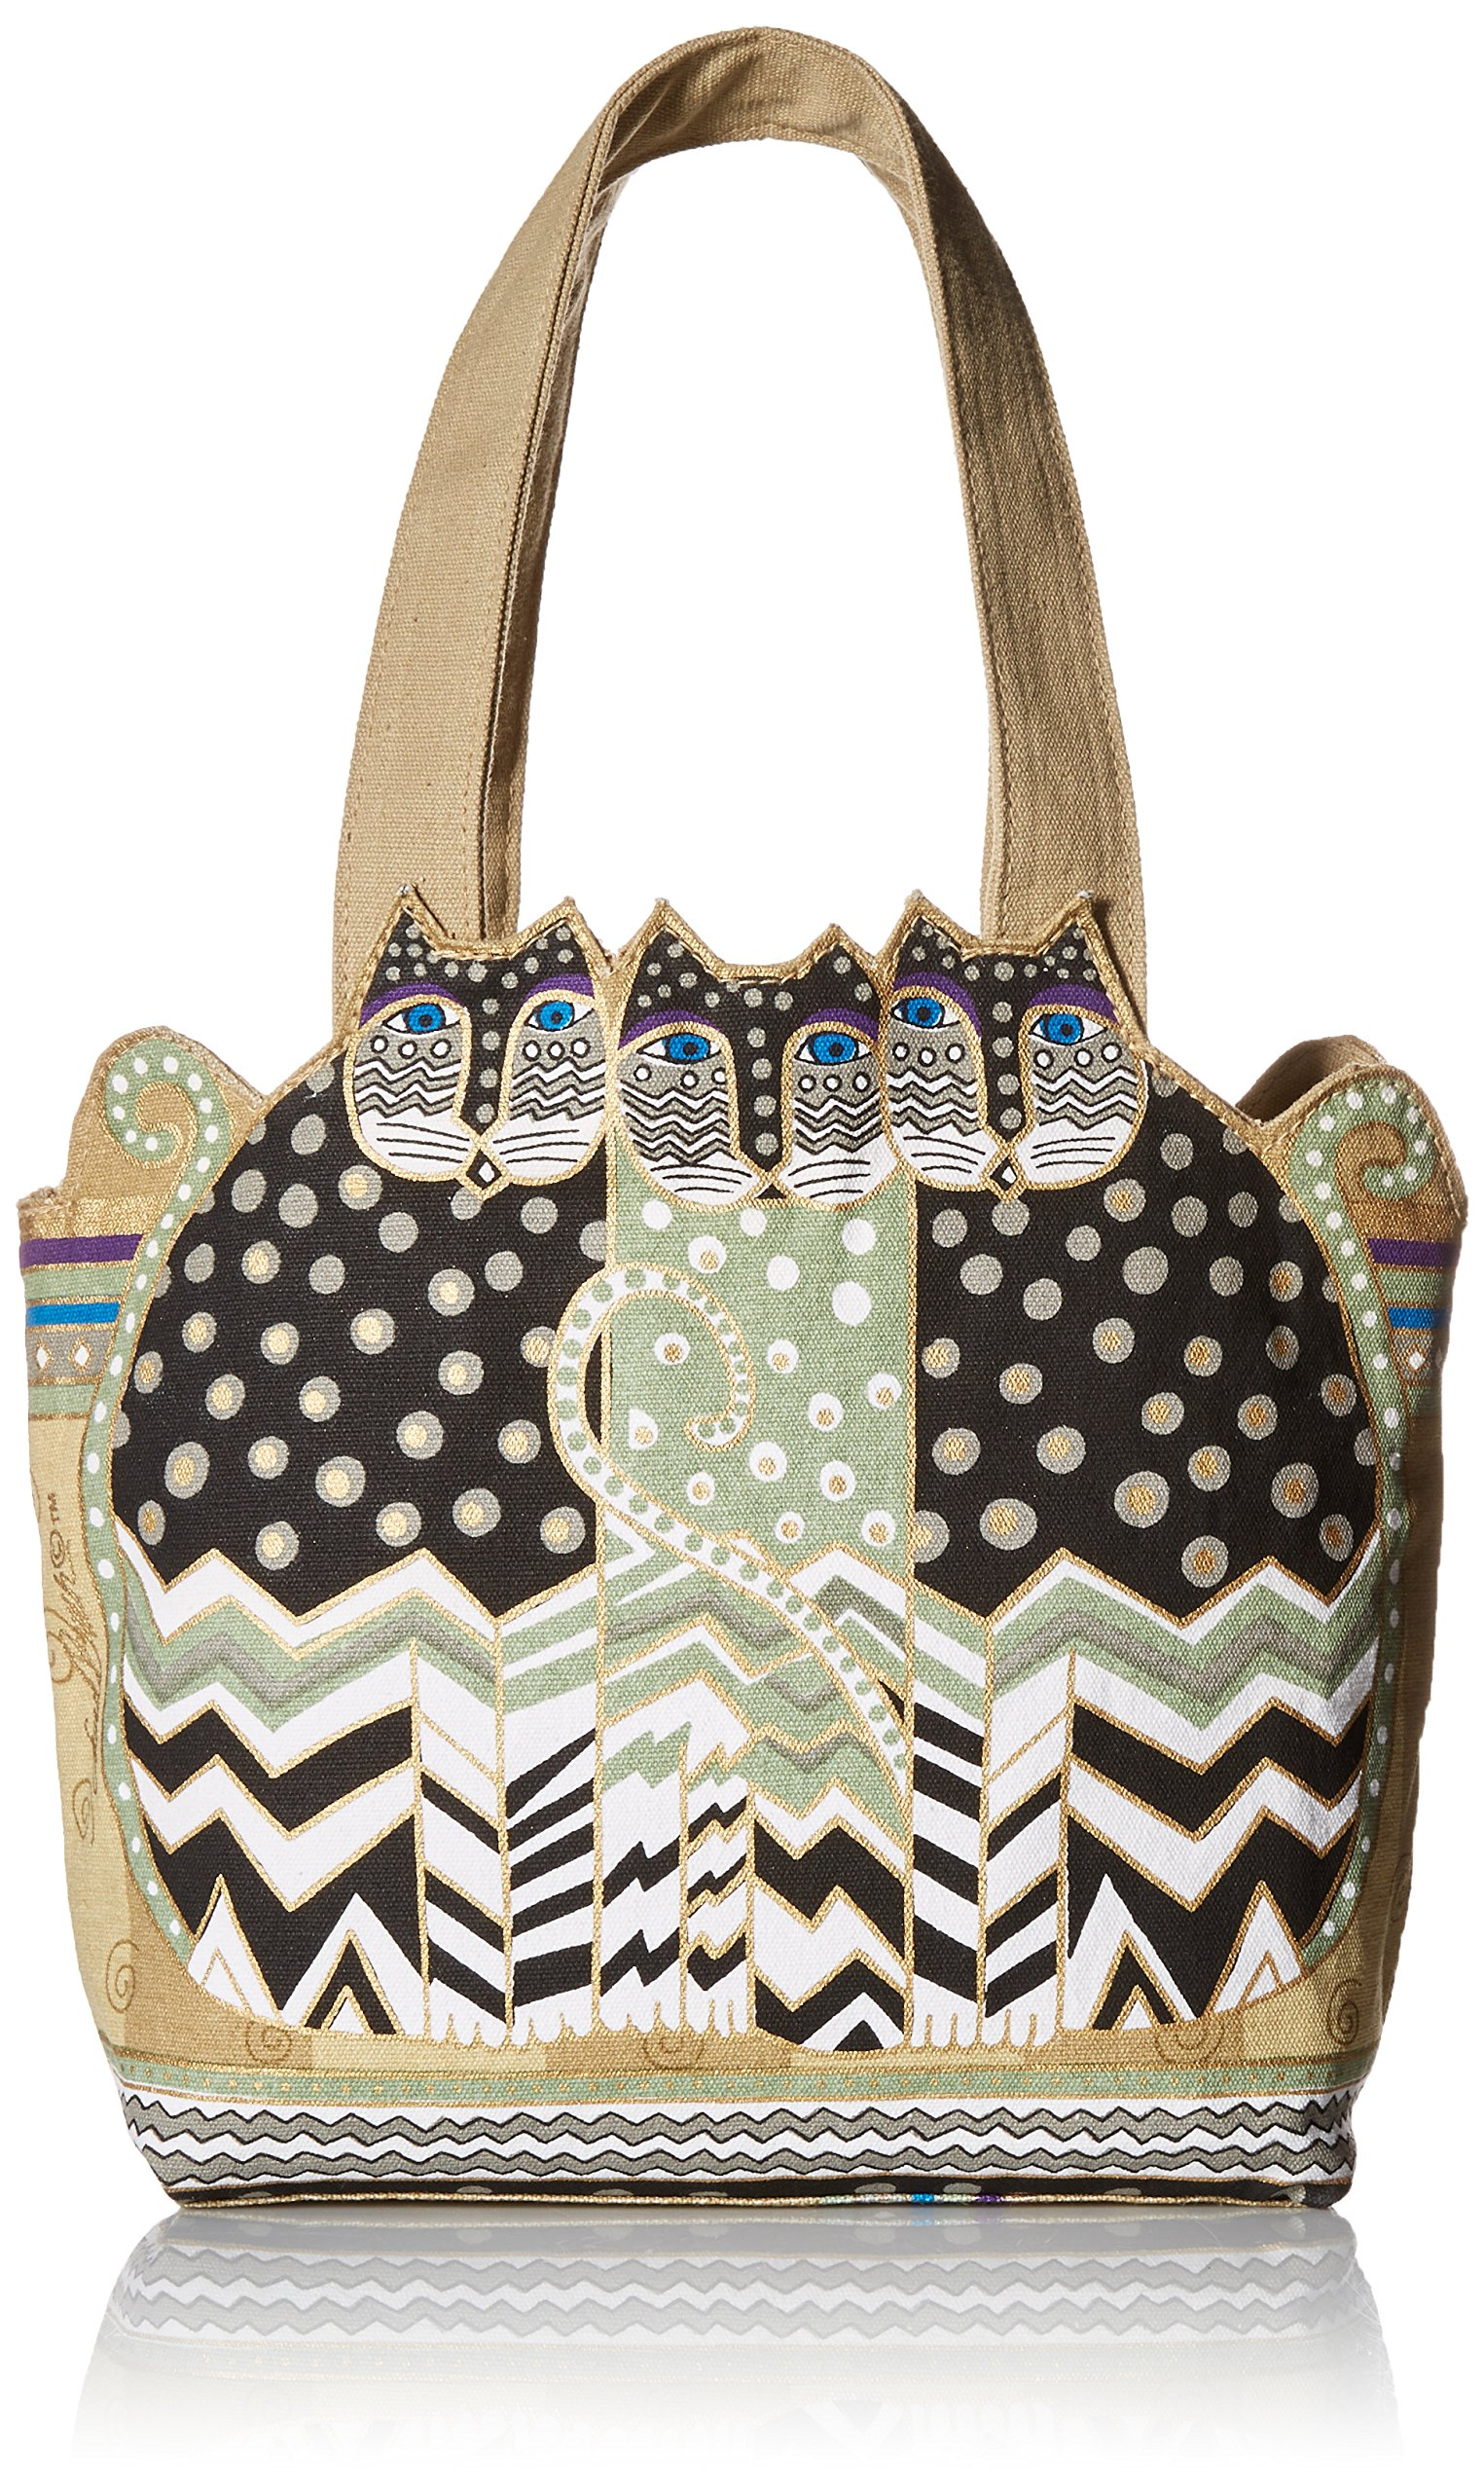 Laurel Burch TRES GATOS Polka Dot Medium Tote Bag